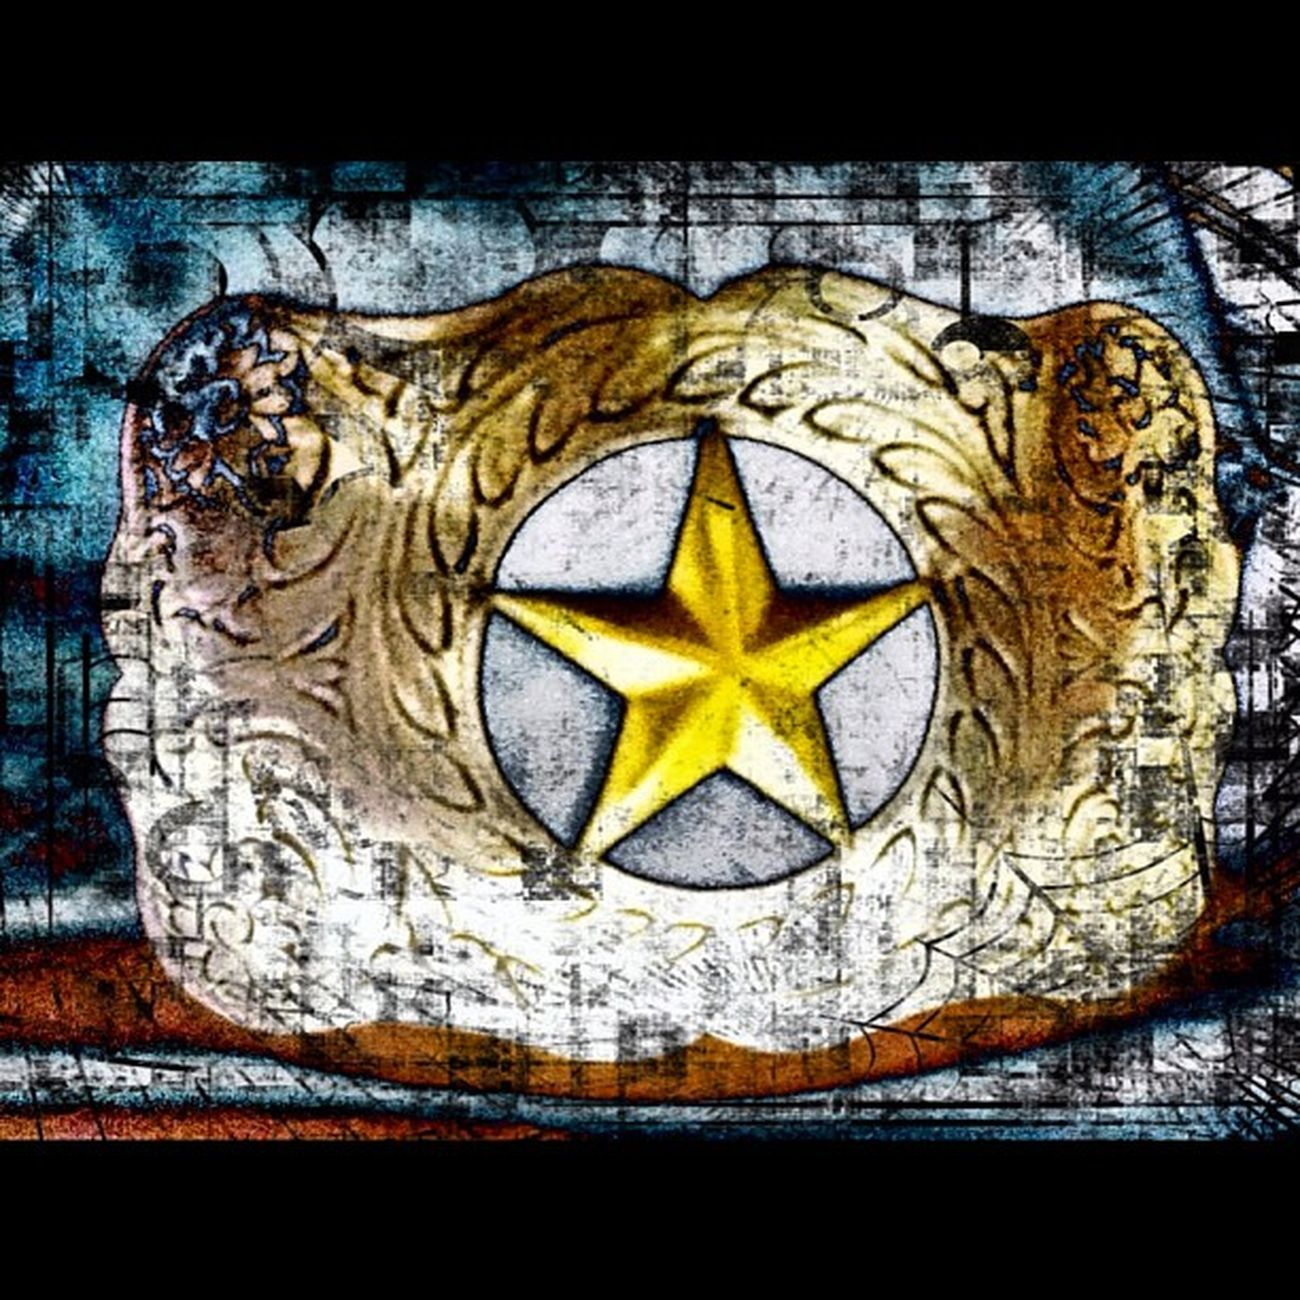 Texas #texas #honkTravel Texas Honktravel